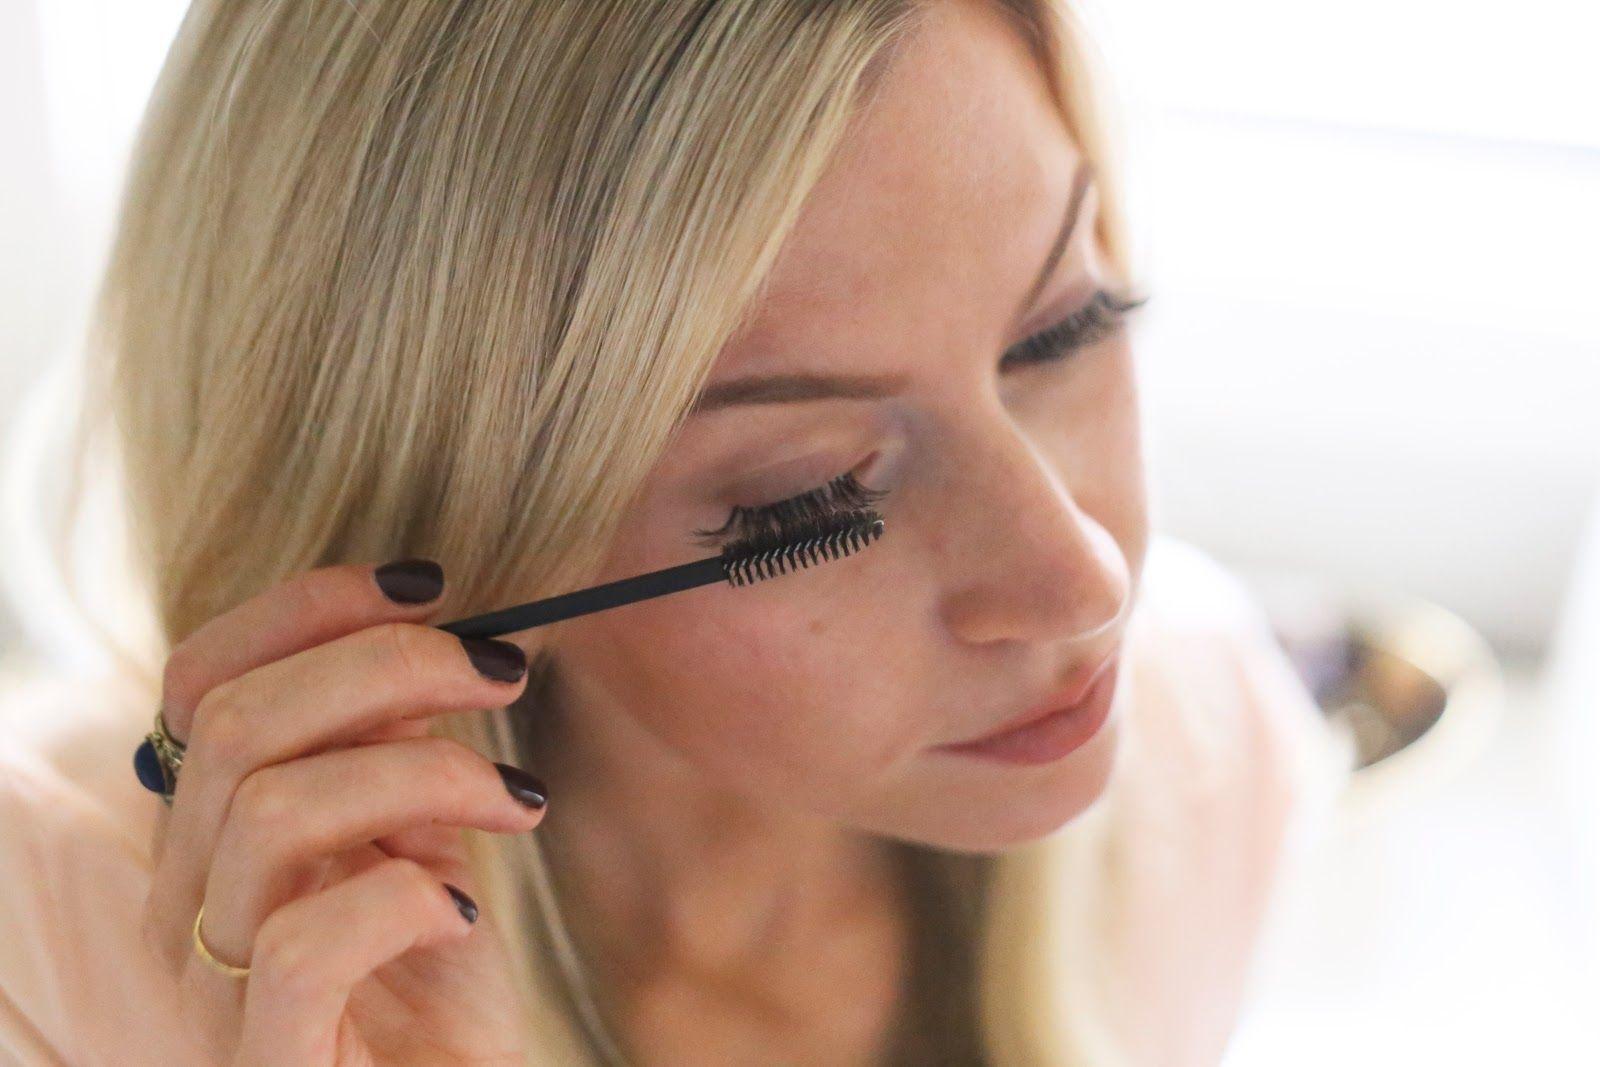 HOW TO APPLY EYELASH EXTENSIONS YOURSELF Fake eyelashes